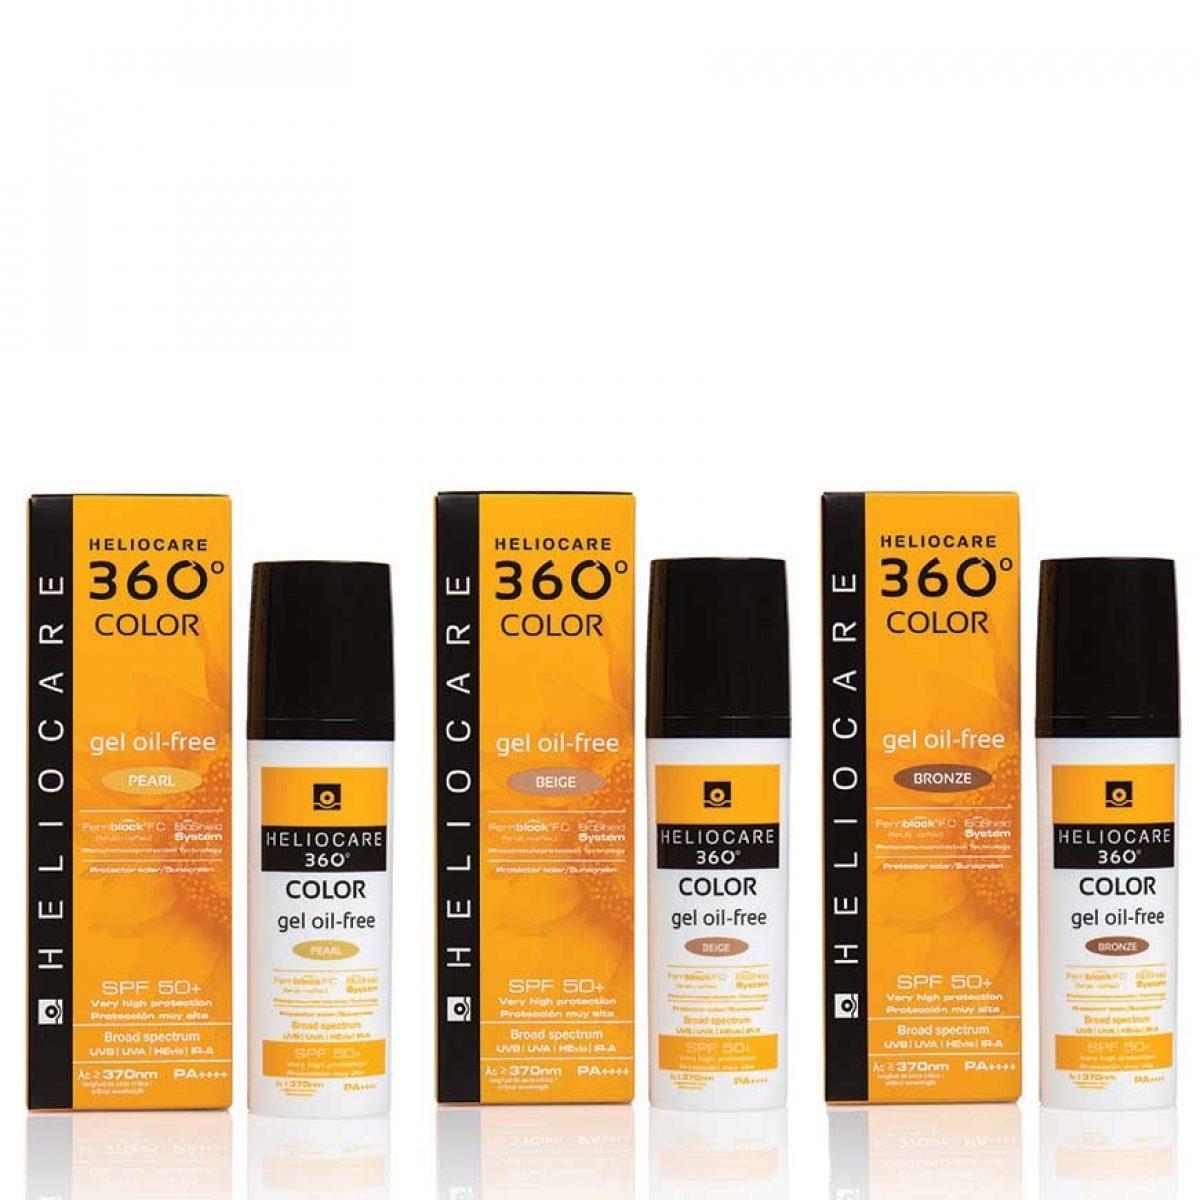 HELIOCARE 360 GEL OIL-FREE PEARL SPF50+ 50ML